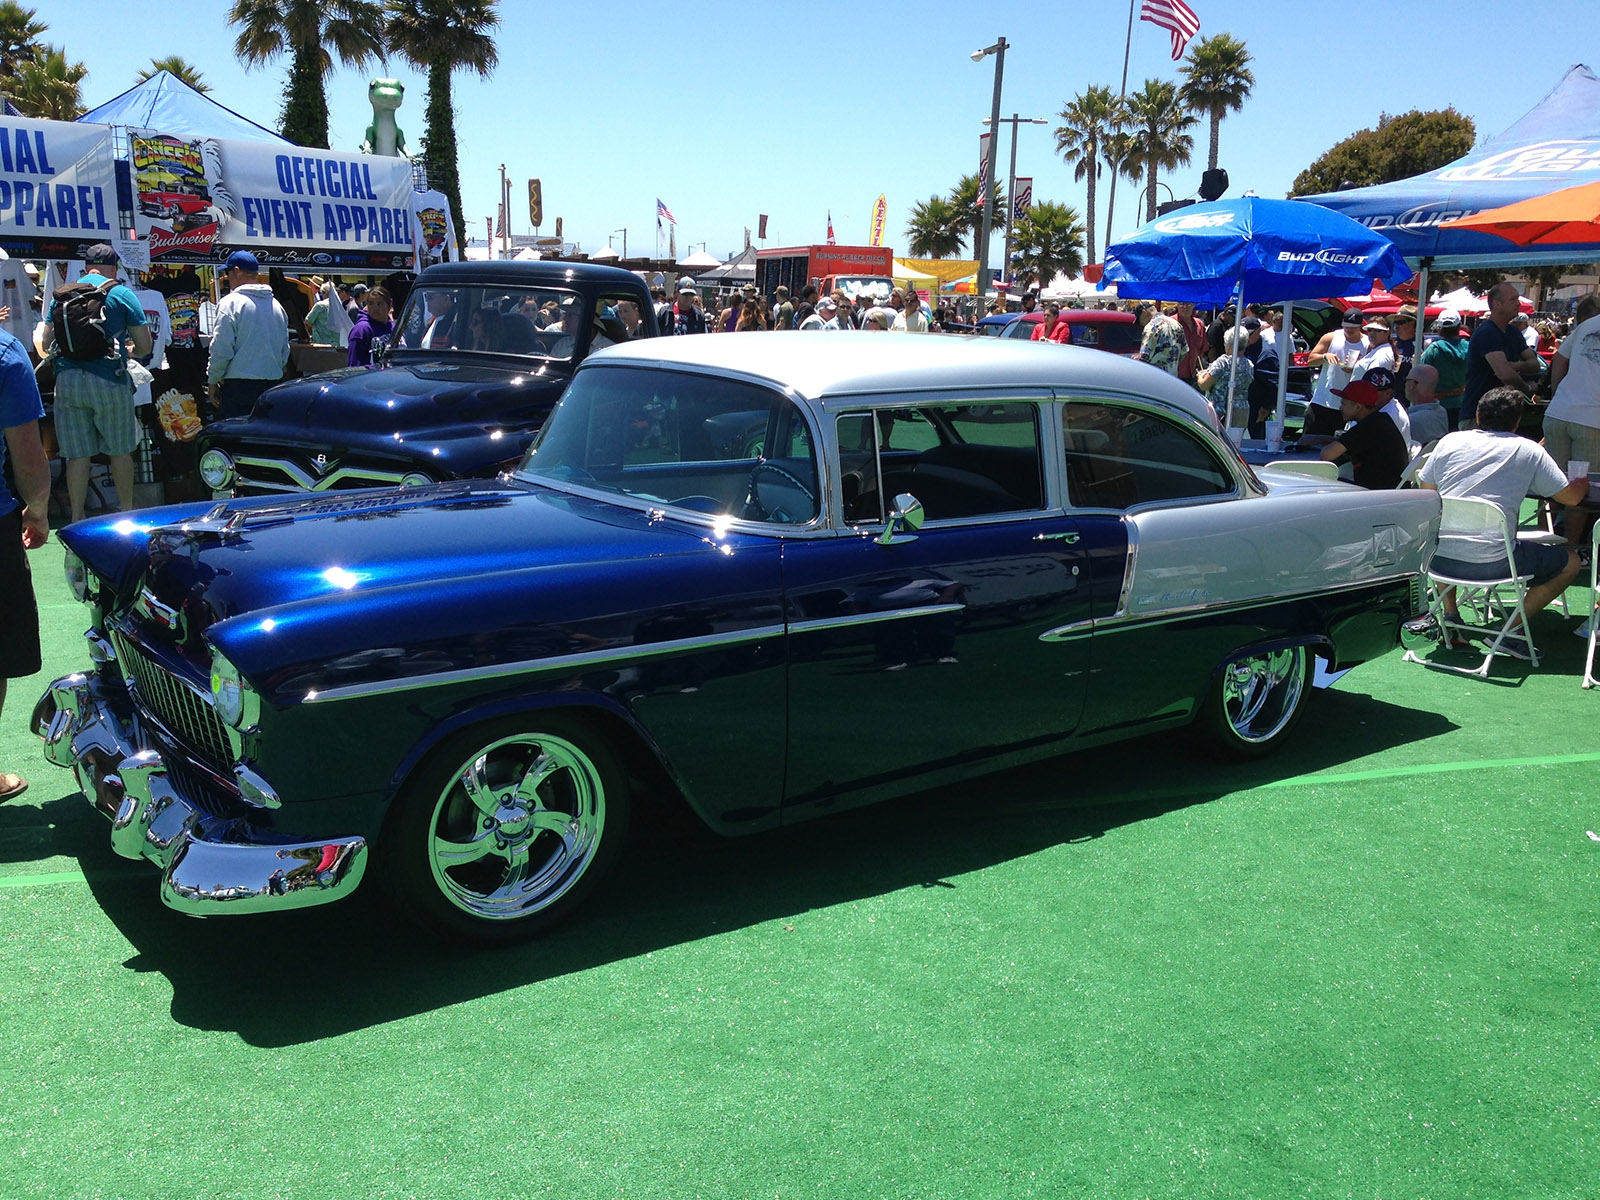 2013 Classic at Pismo Beach car show Award Winners